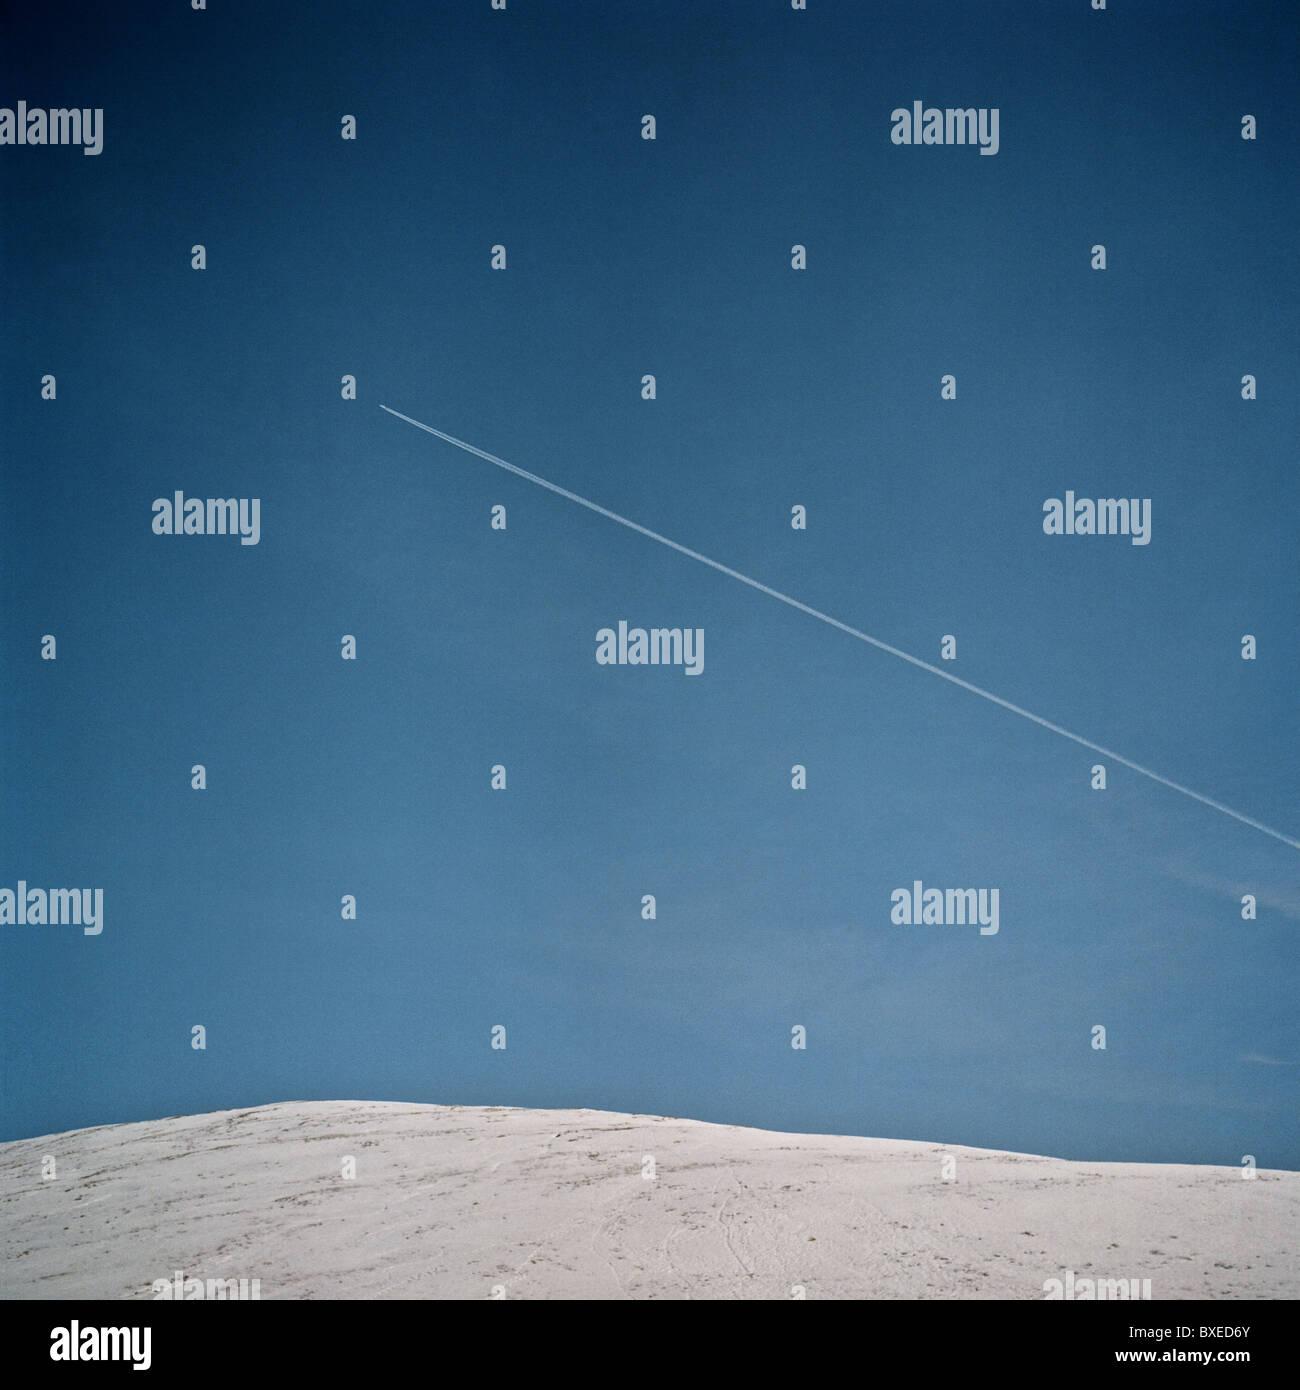 Aircraft vapor trail across blue sky. - Stock Image